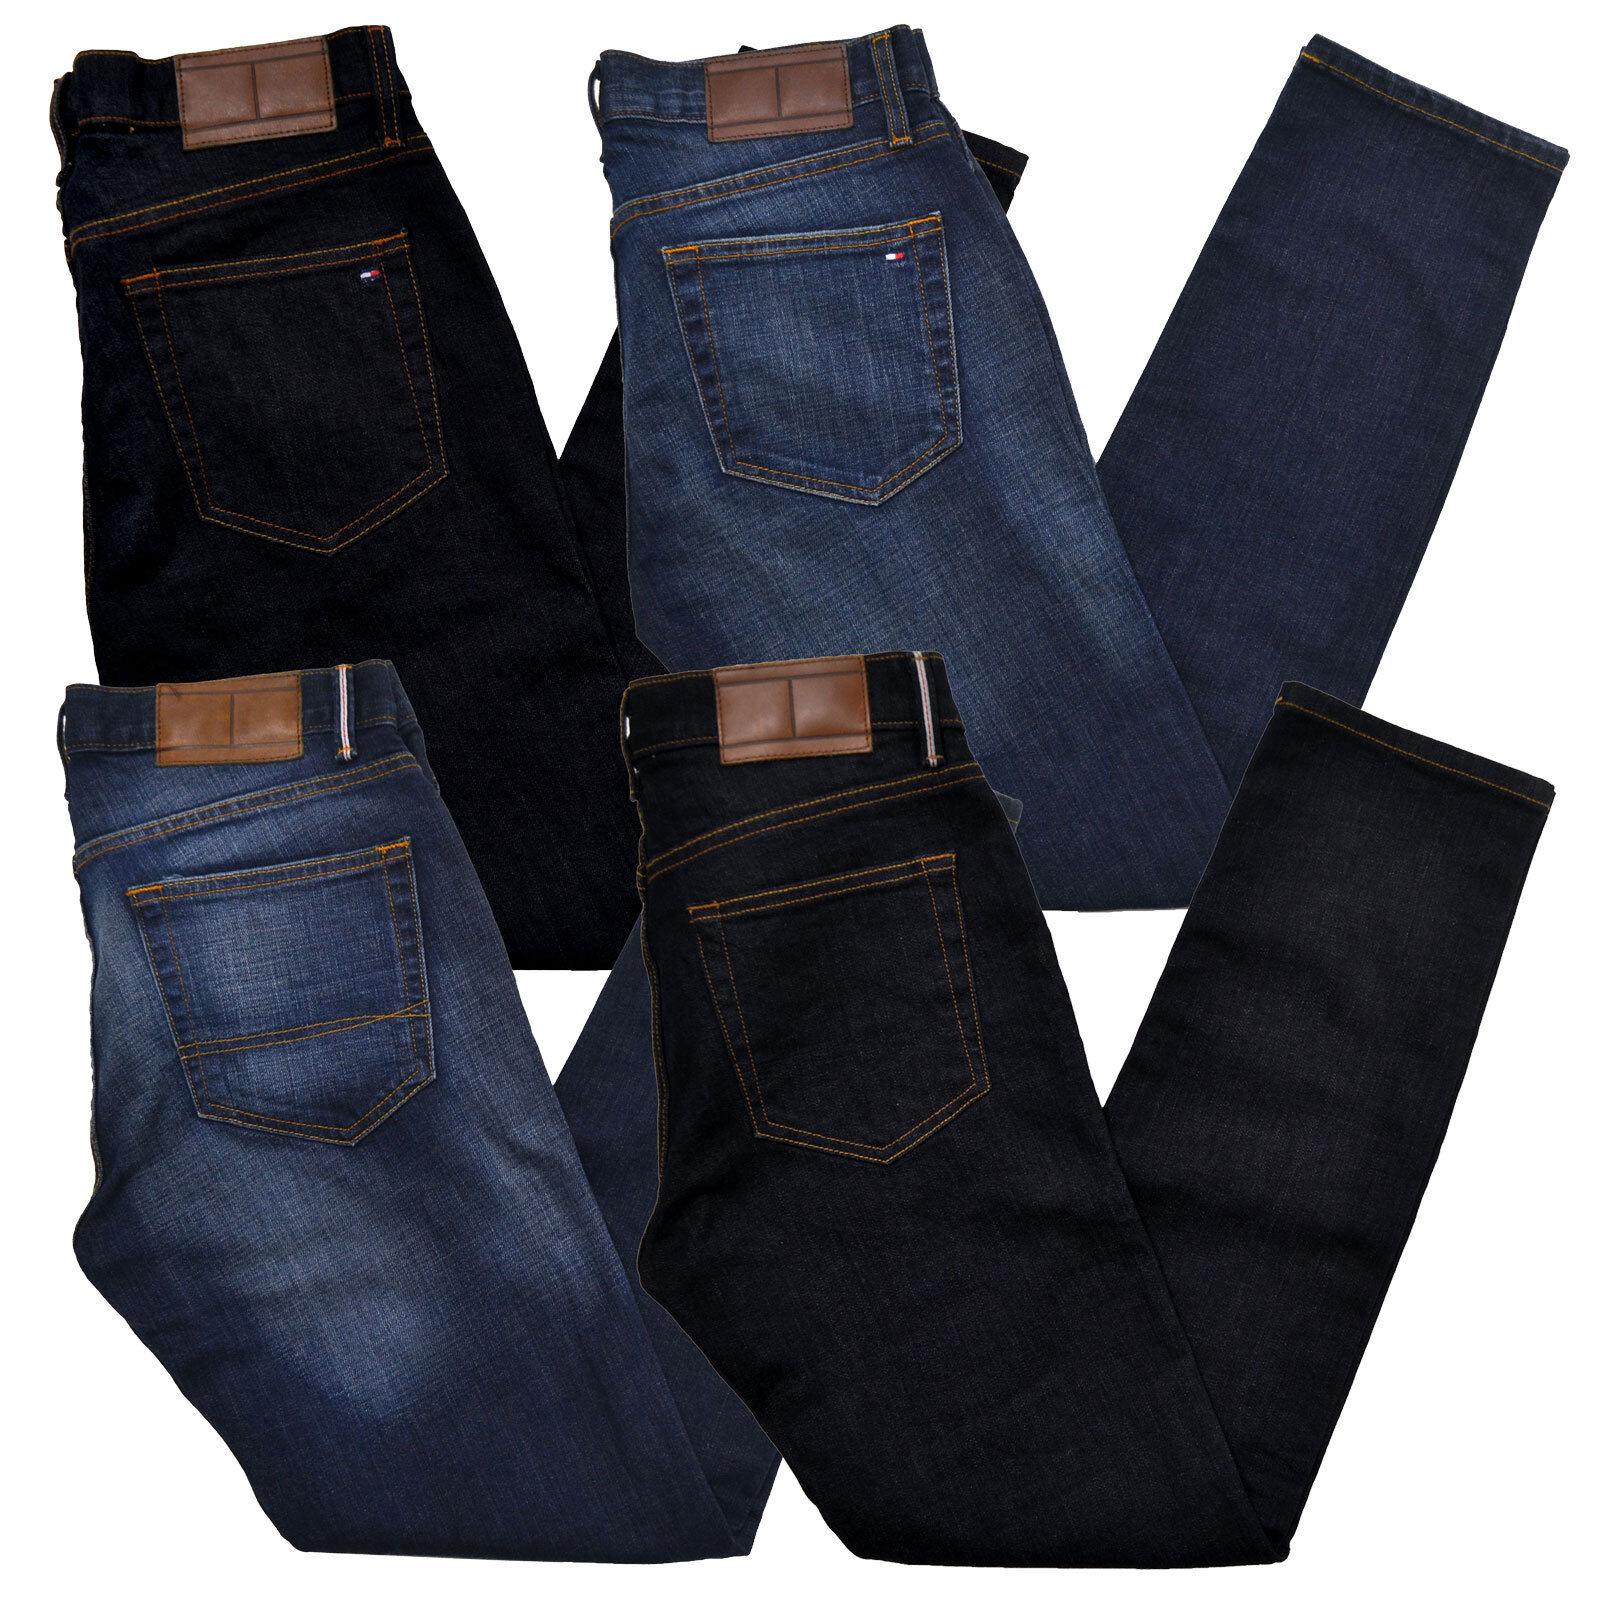 Tommy Hilfiger 36w 32l Mens Blue Jeans Casual Slim Fit Mid Rise Denim Pants For Sale Online Ebay